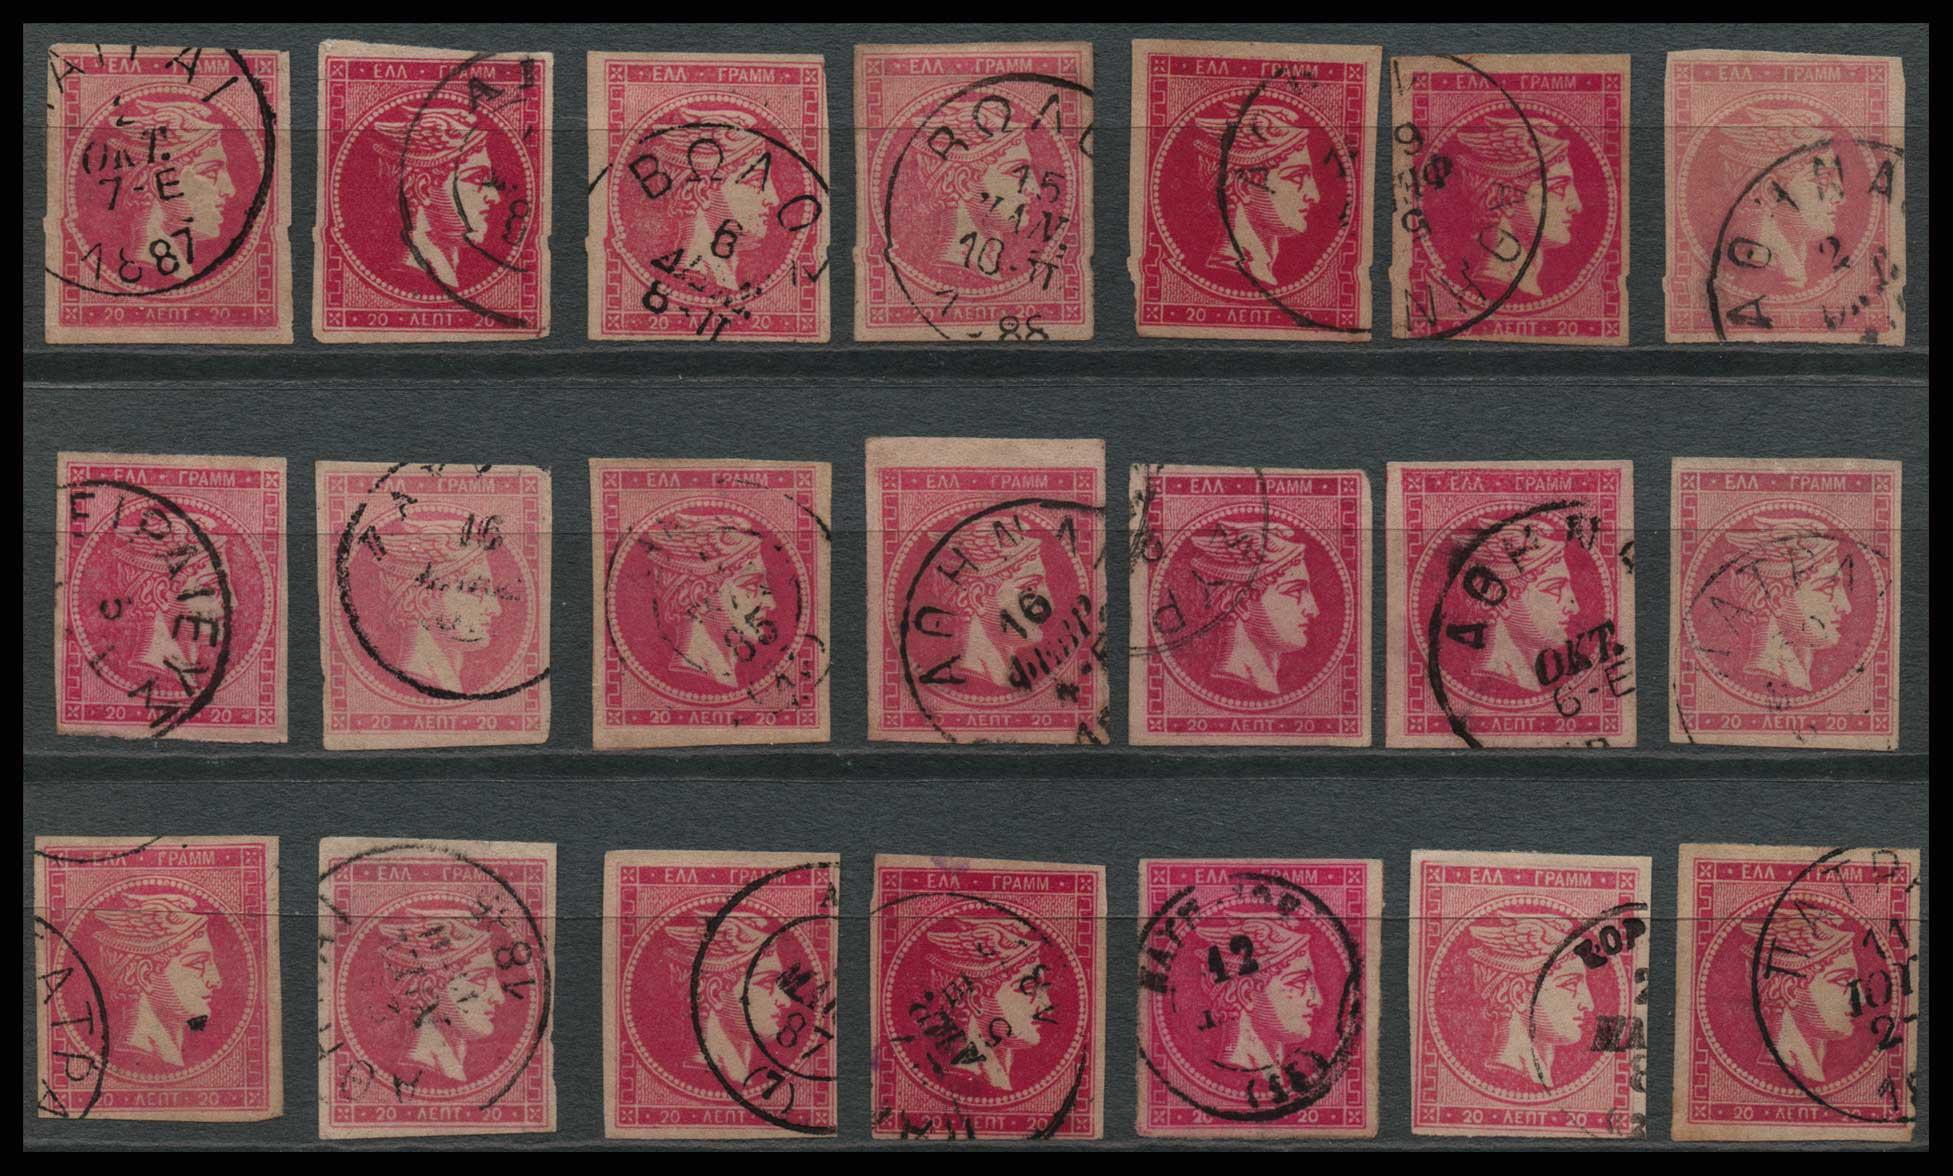 Lot 30 - -  LARGE HERMES HEAD large hermes head -  Athens Auctions Public Auction 82 General Stamp Sale